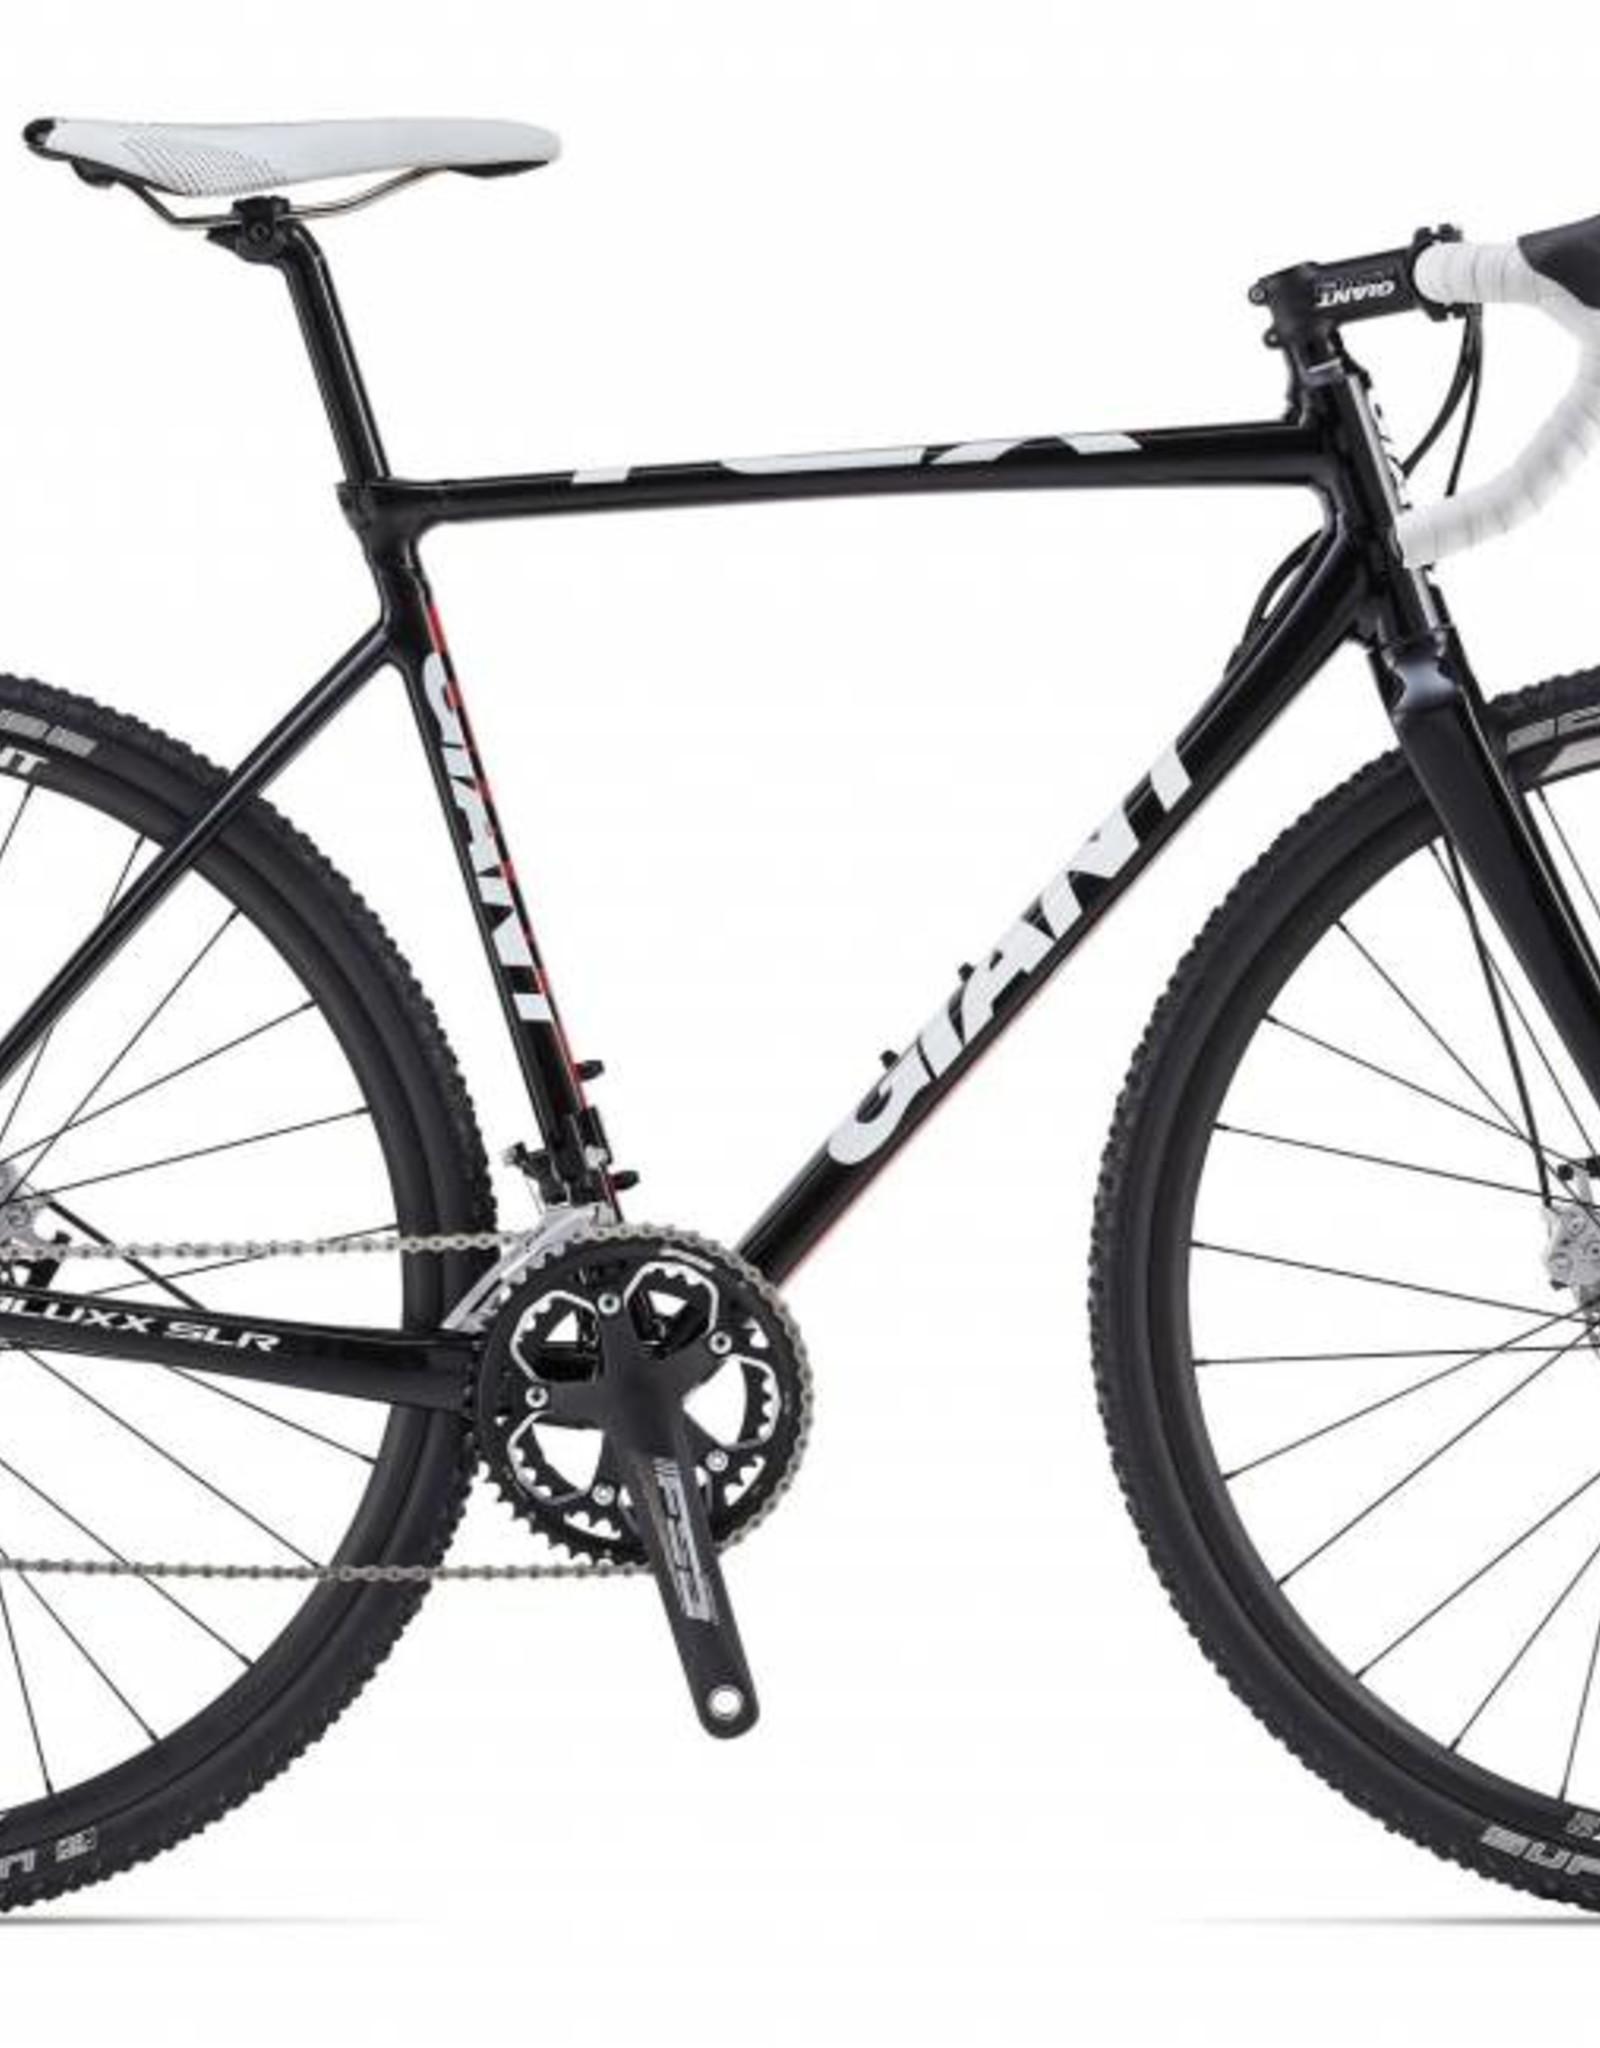 Giant Giant TCX SLR 2 2014 Black/White/Red M Bicycle